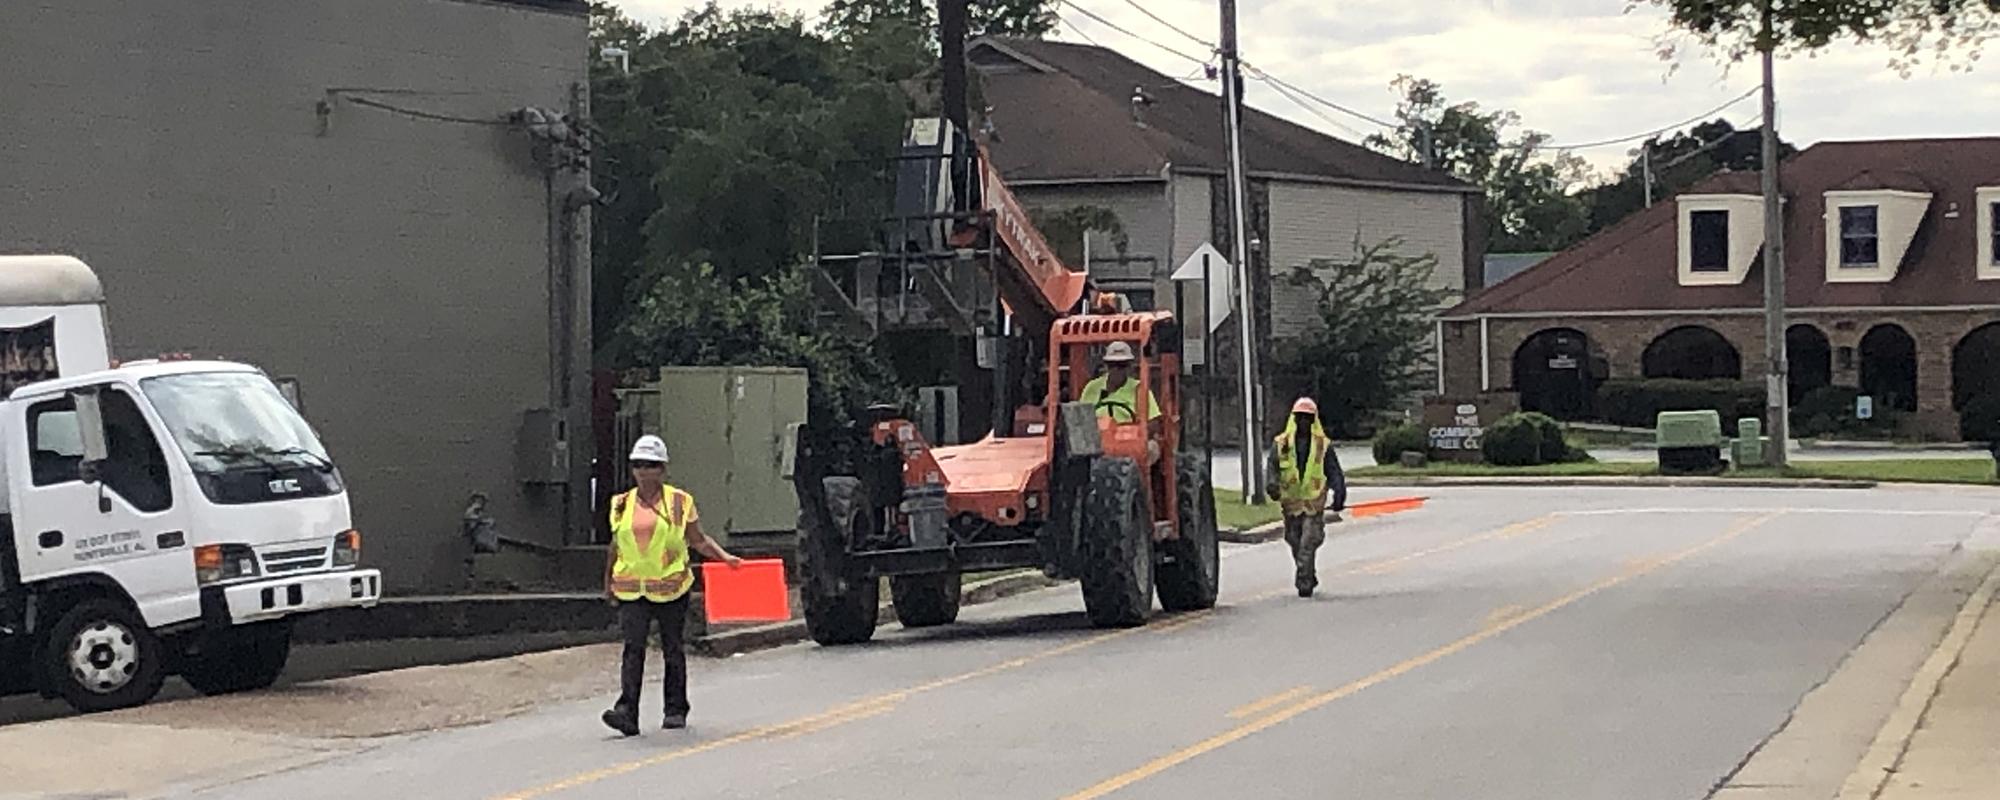 construction equipment guidance